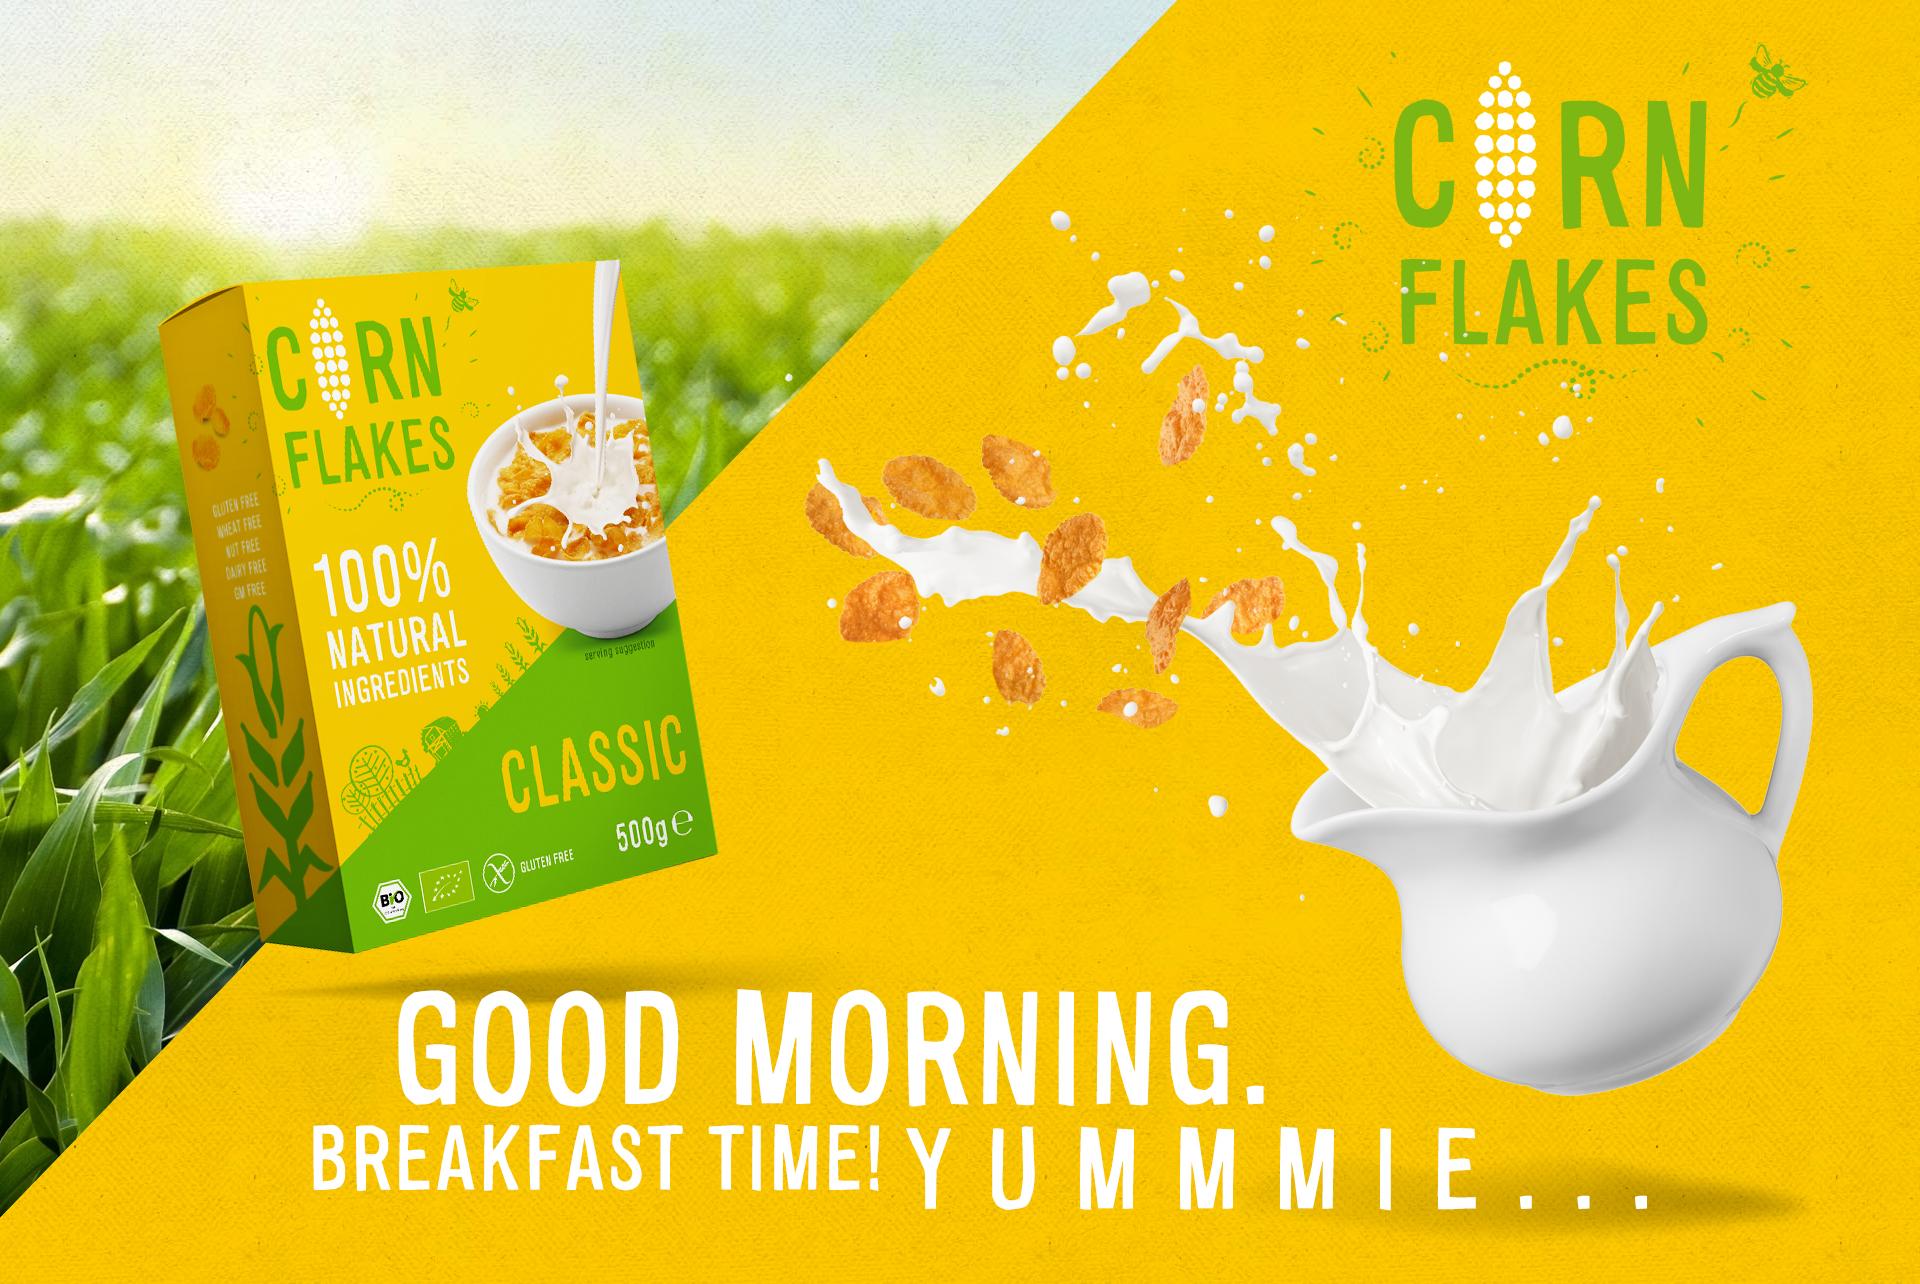 Corn Flakes Packaging Design KeyVisual